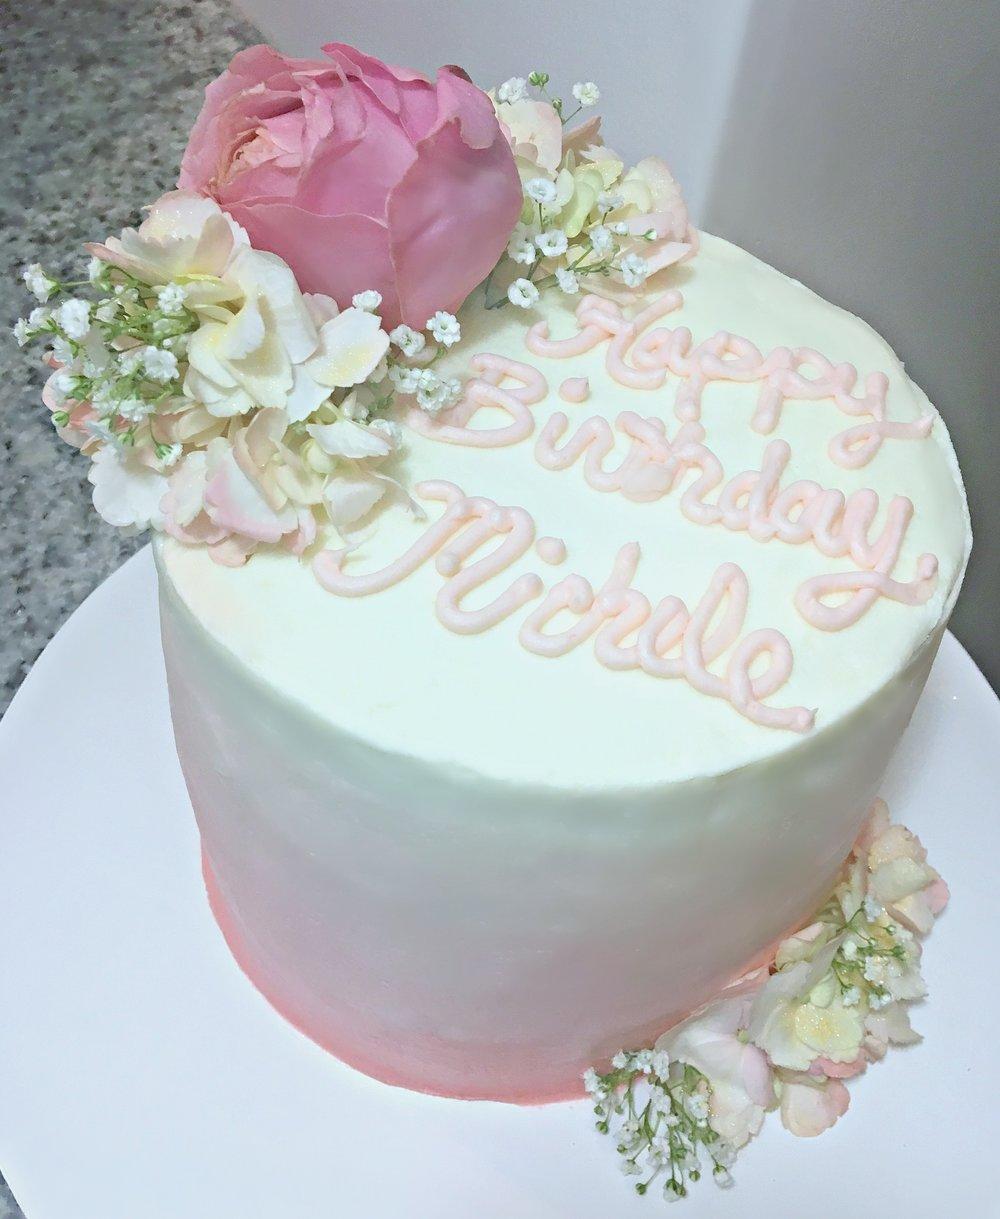 linda cake 2.jpg